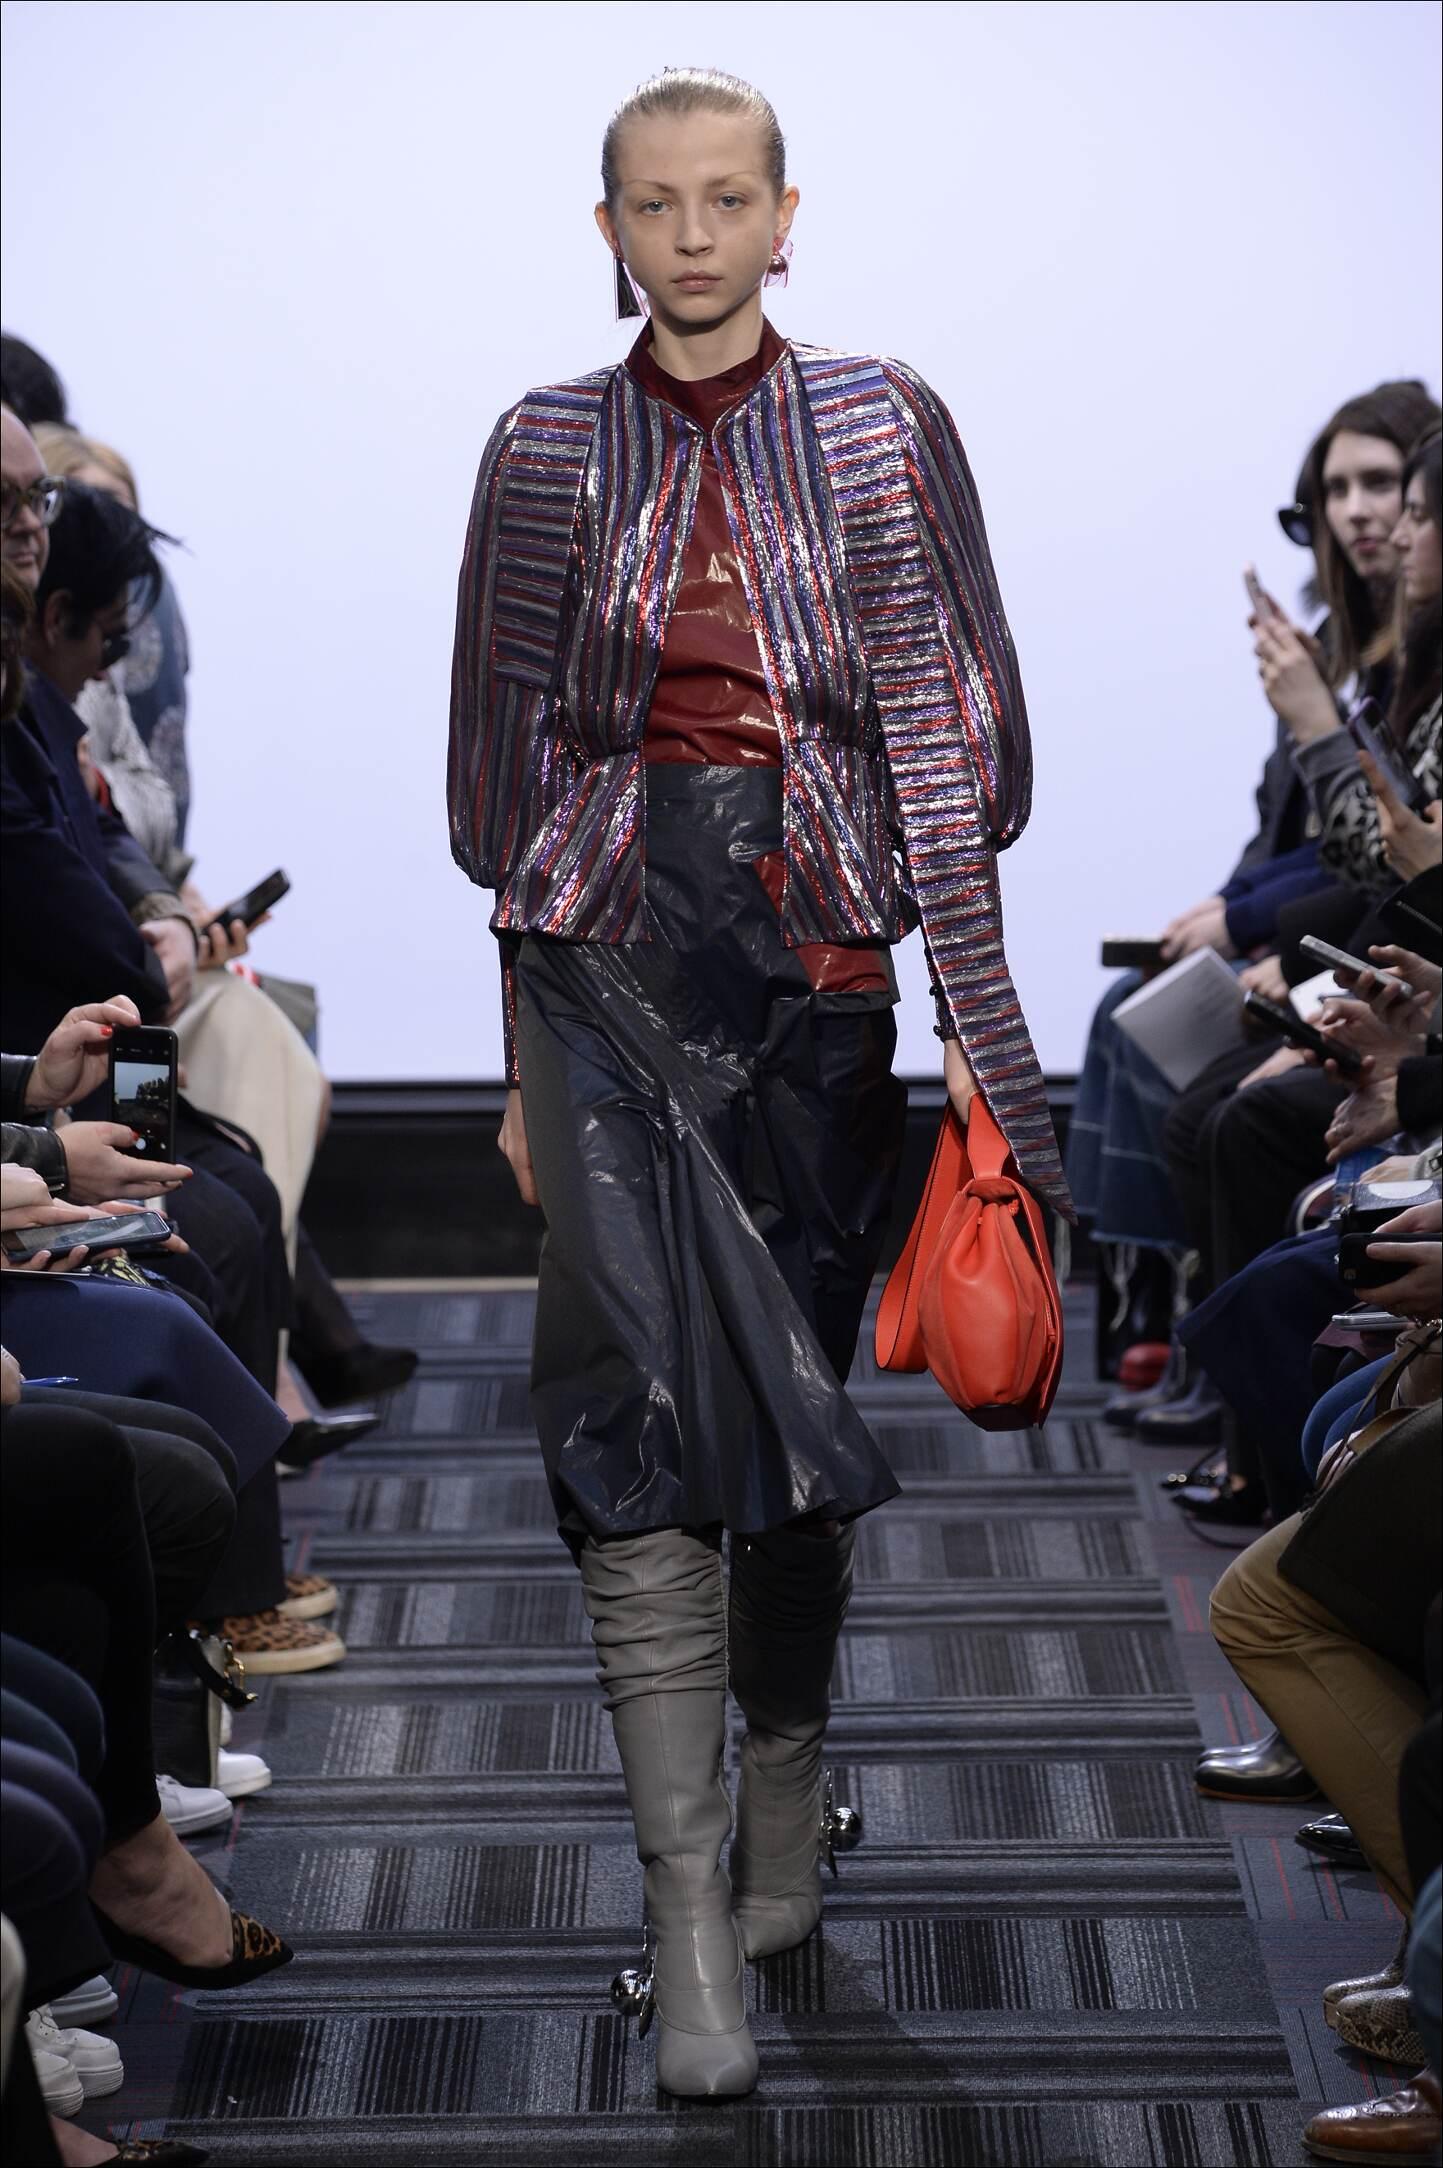 Catwalk J.W. Anderson Fall Winter 2015 16 Women's Collection London Fashion Week